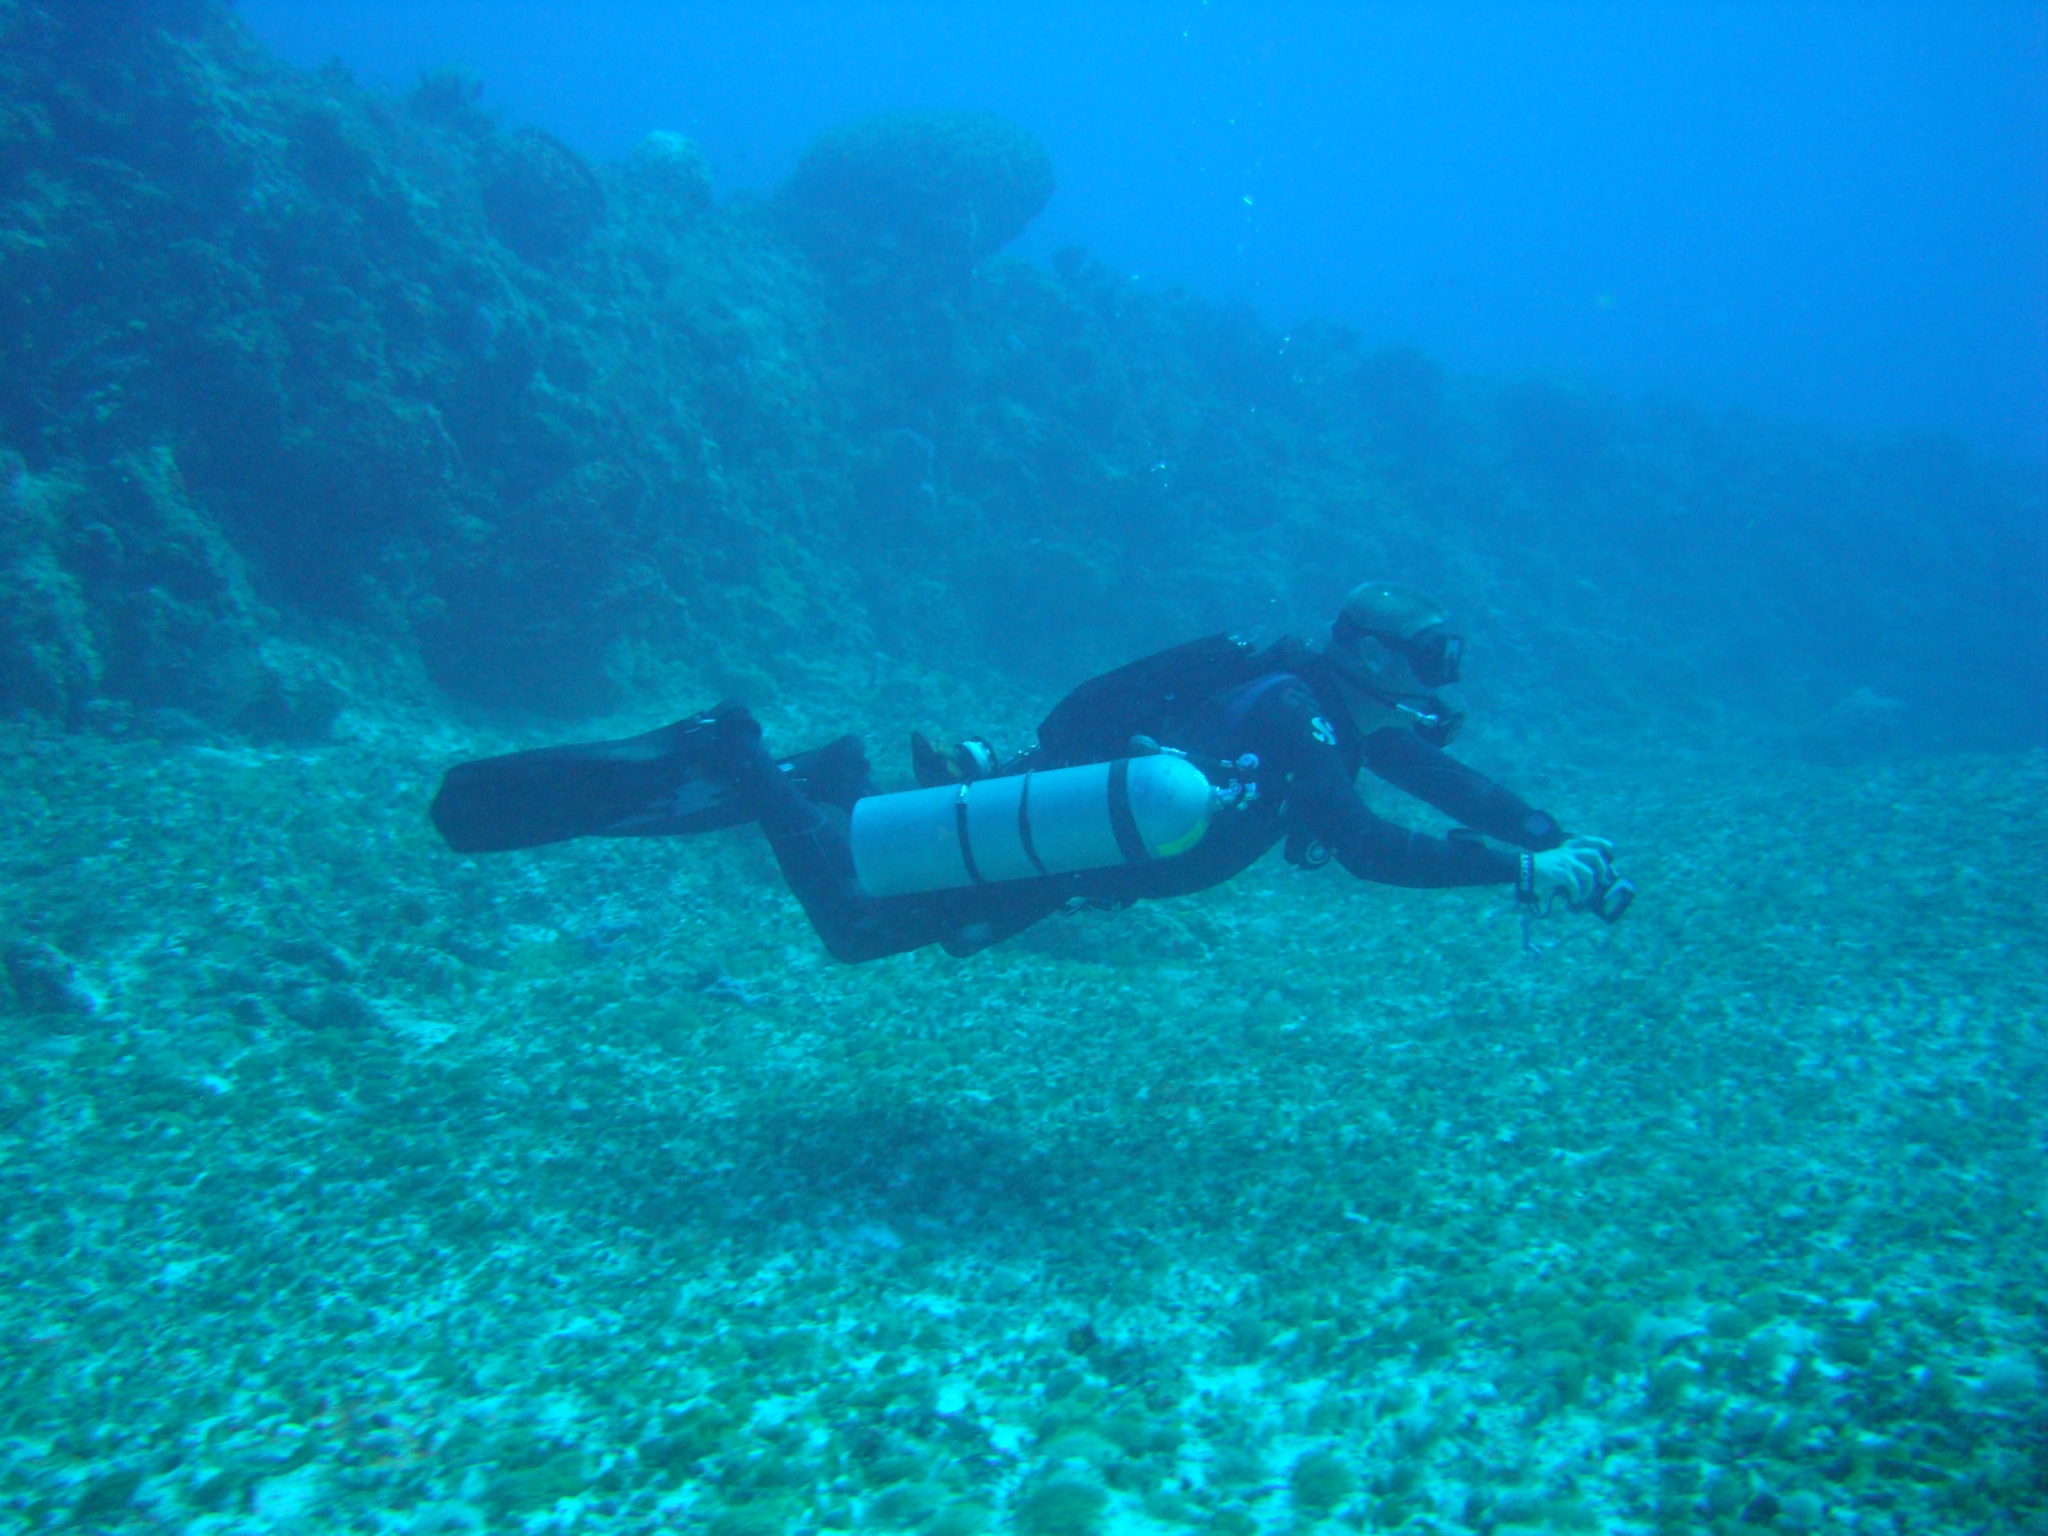 Mexico scuba diving: Open water sidemount course Playa del Carmen